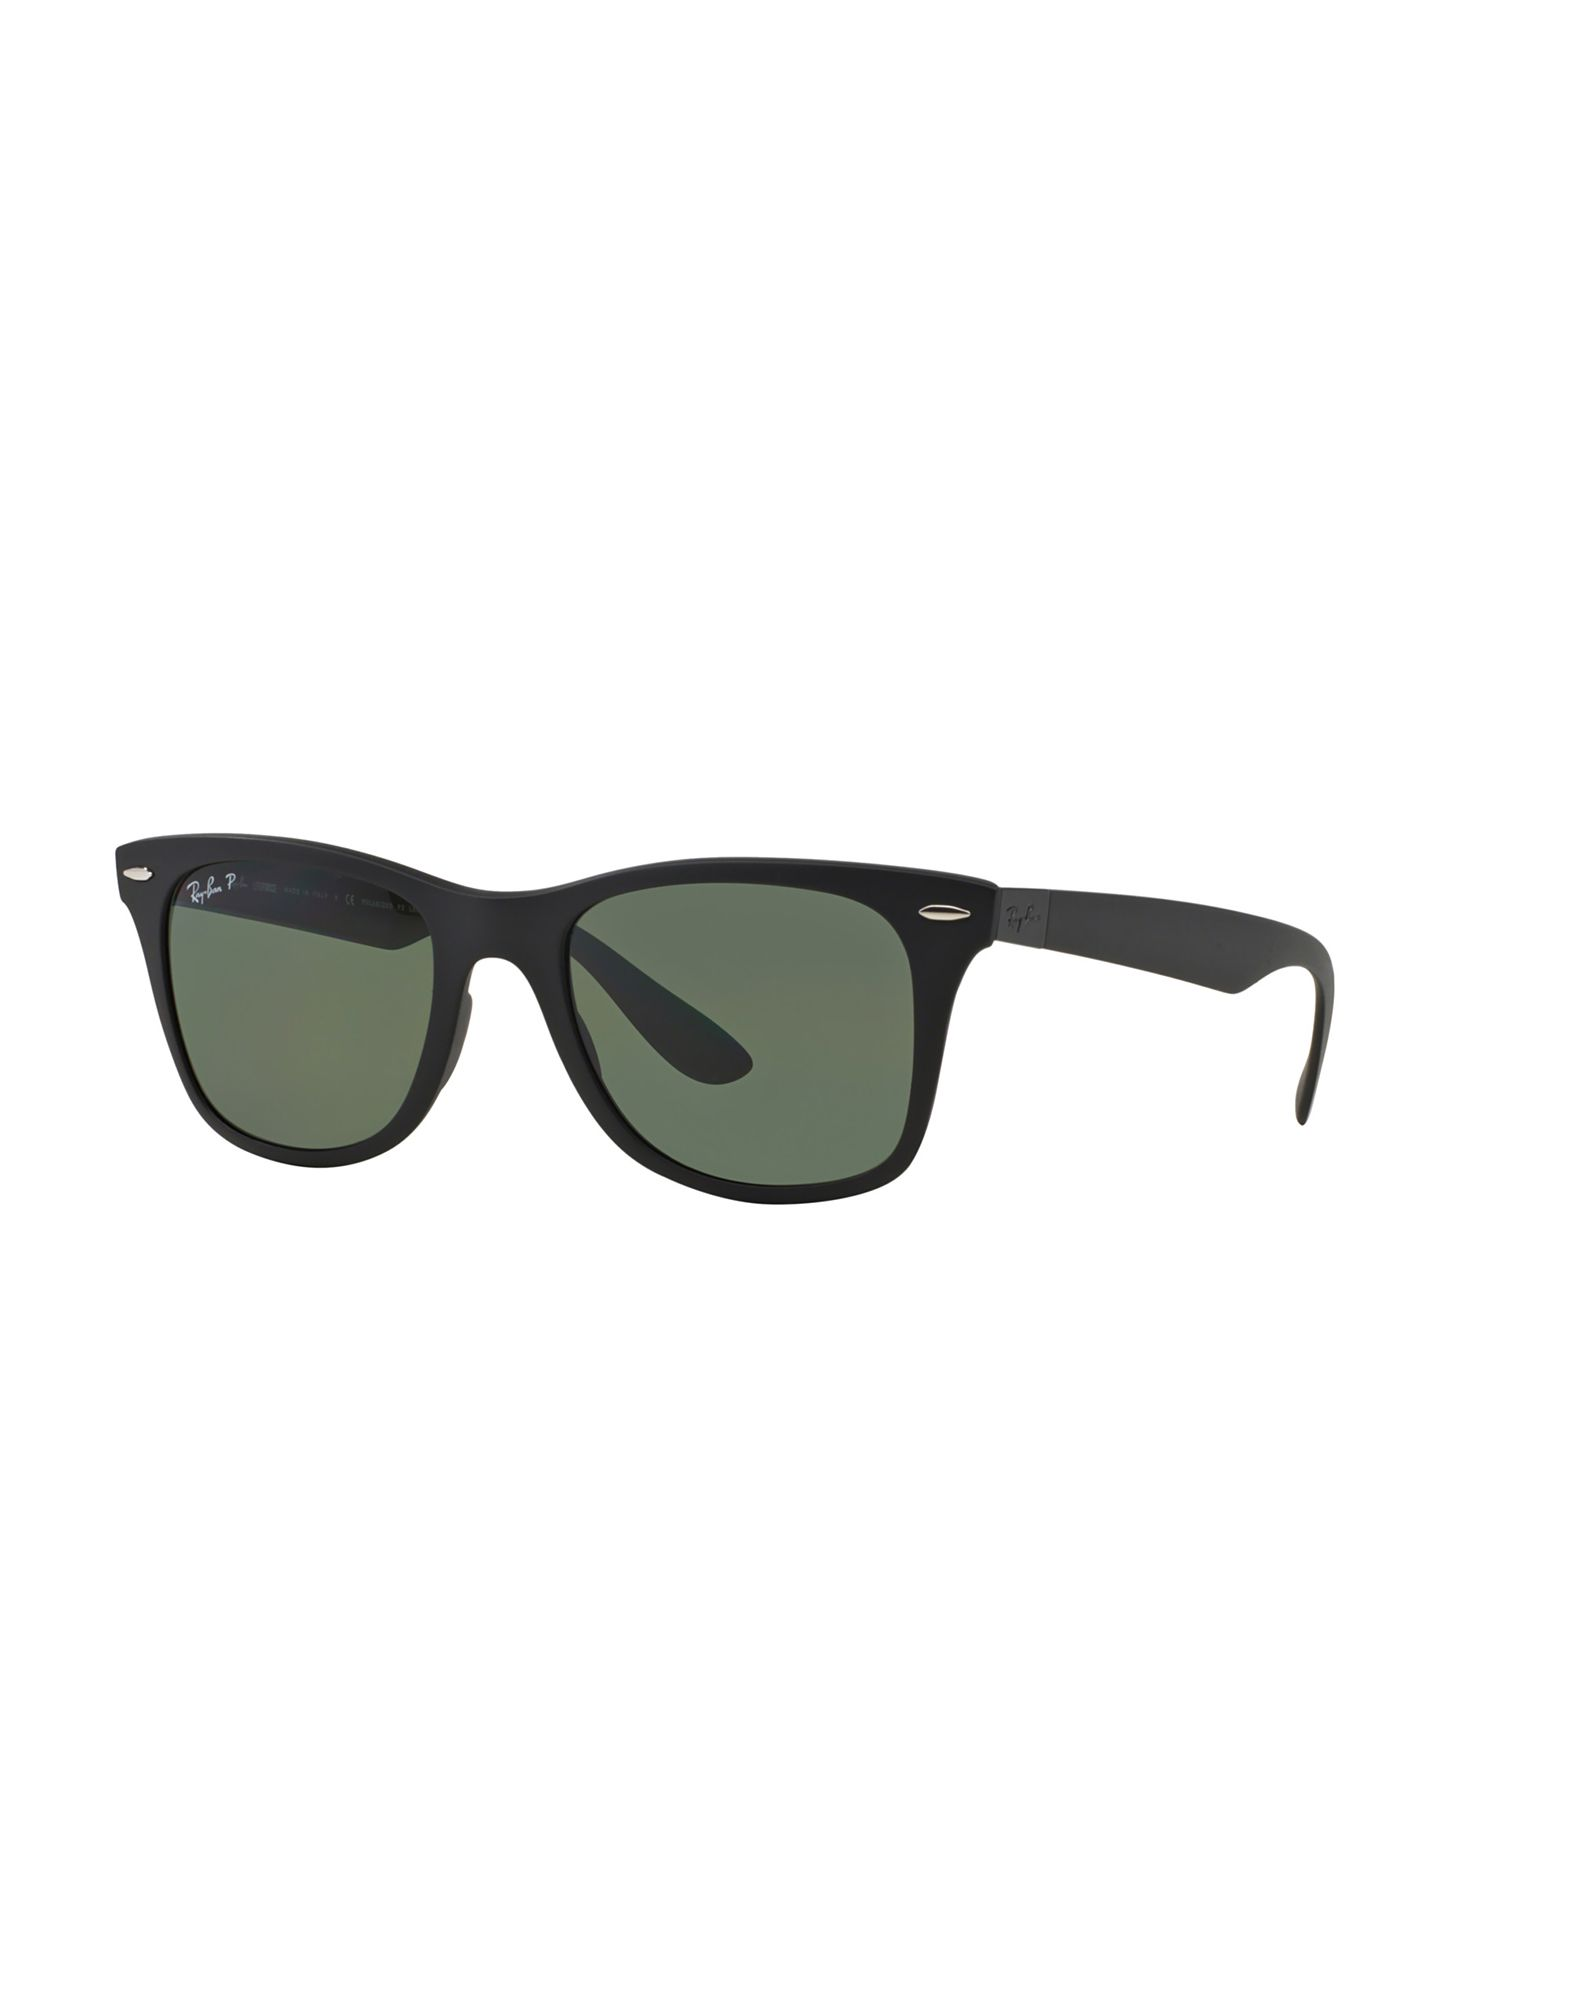 RAY-BAN Солнечные очки солнцезащитные очки ray ban rayban rb3025